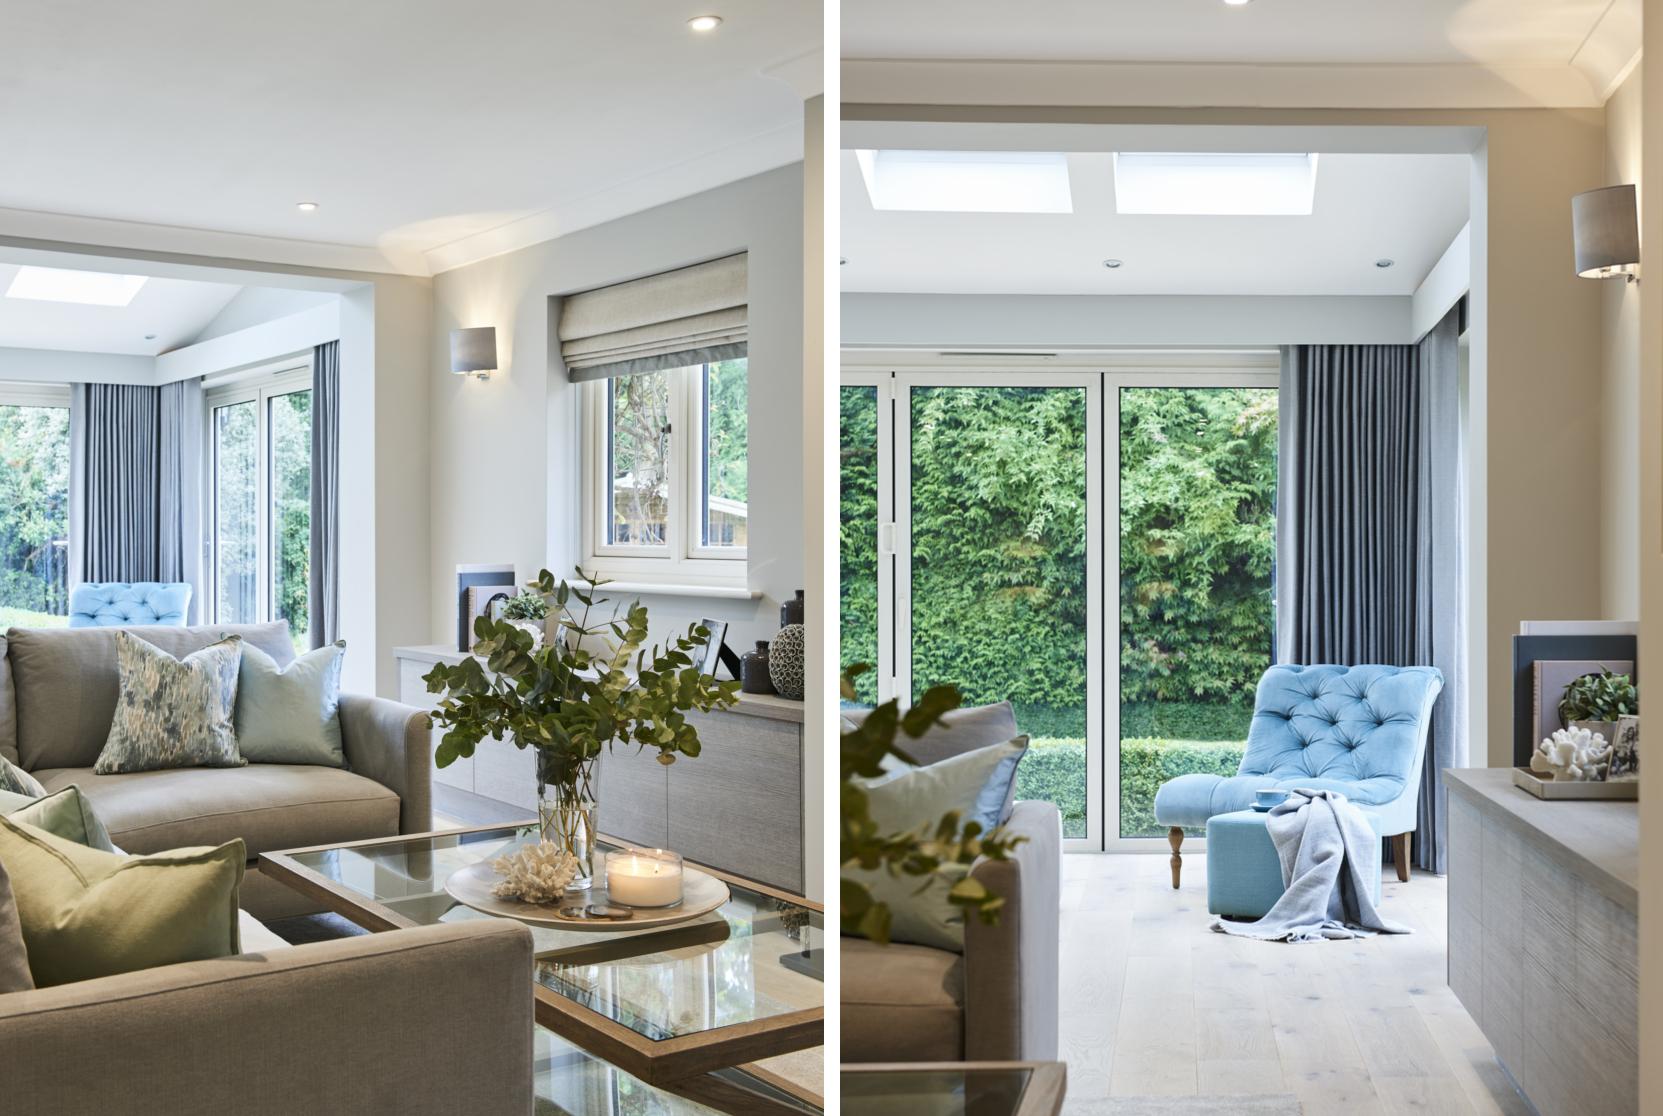 Claire-Garner-Interiors-Linden-House-7